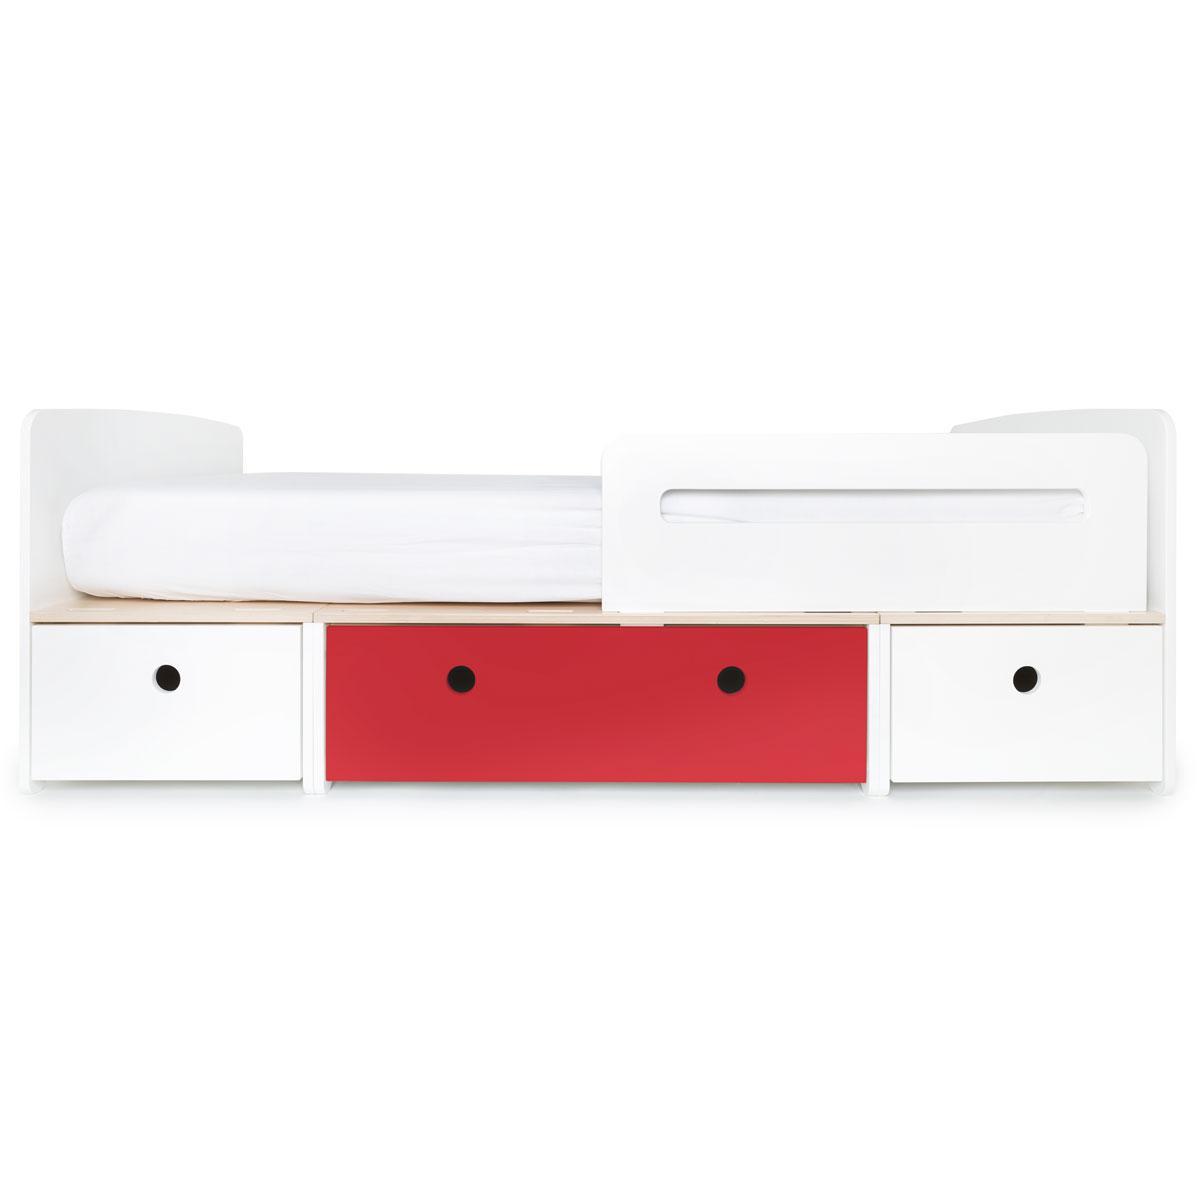 Lit évolutif 90x200cm COLORFLEX white-true red-white